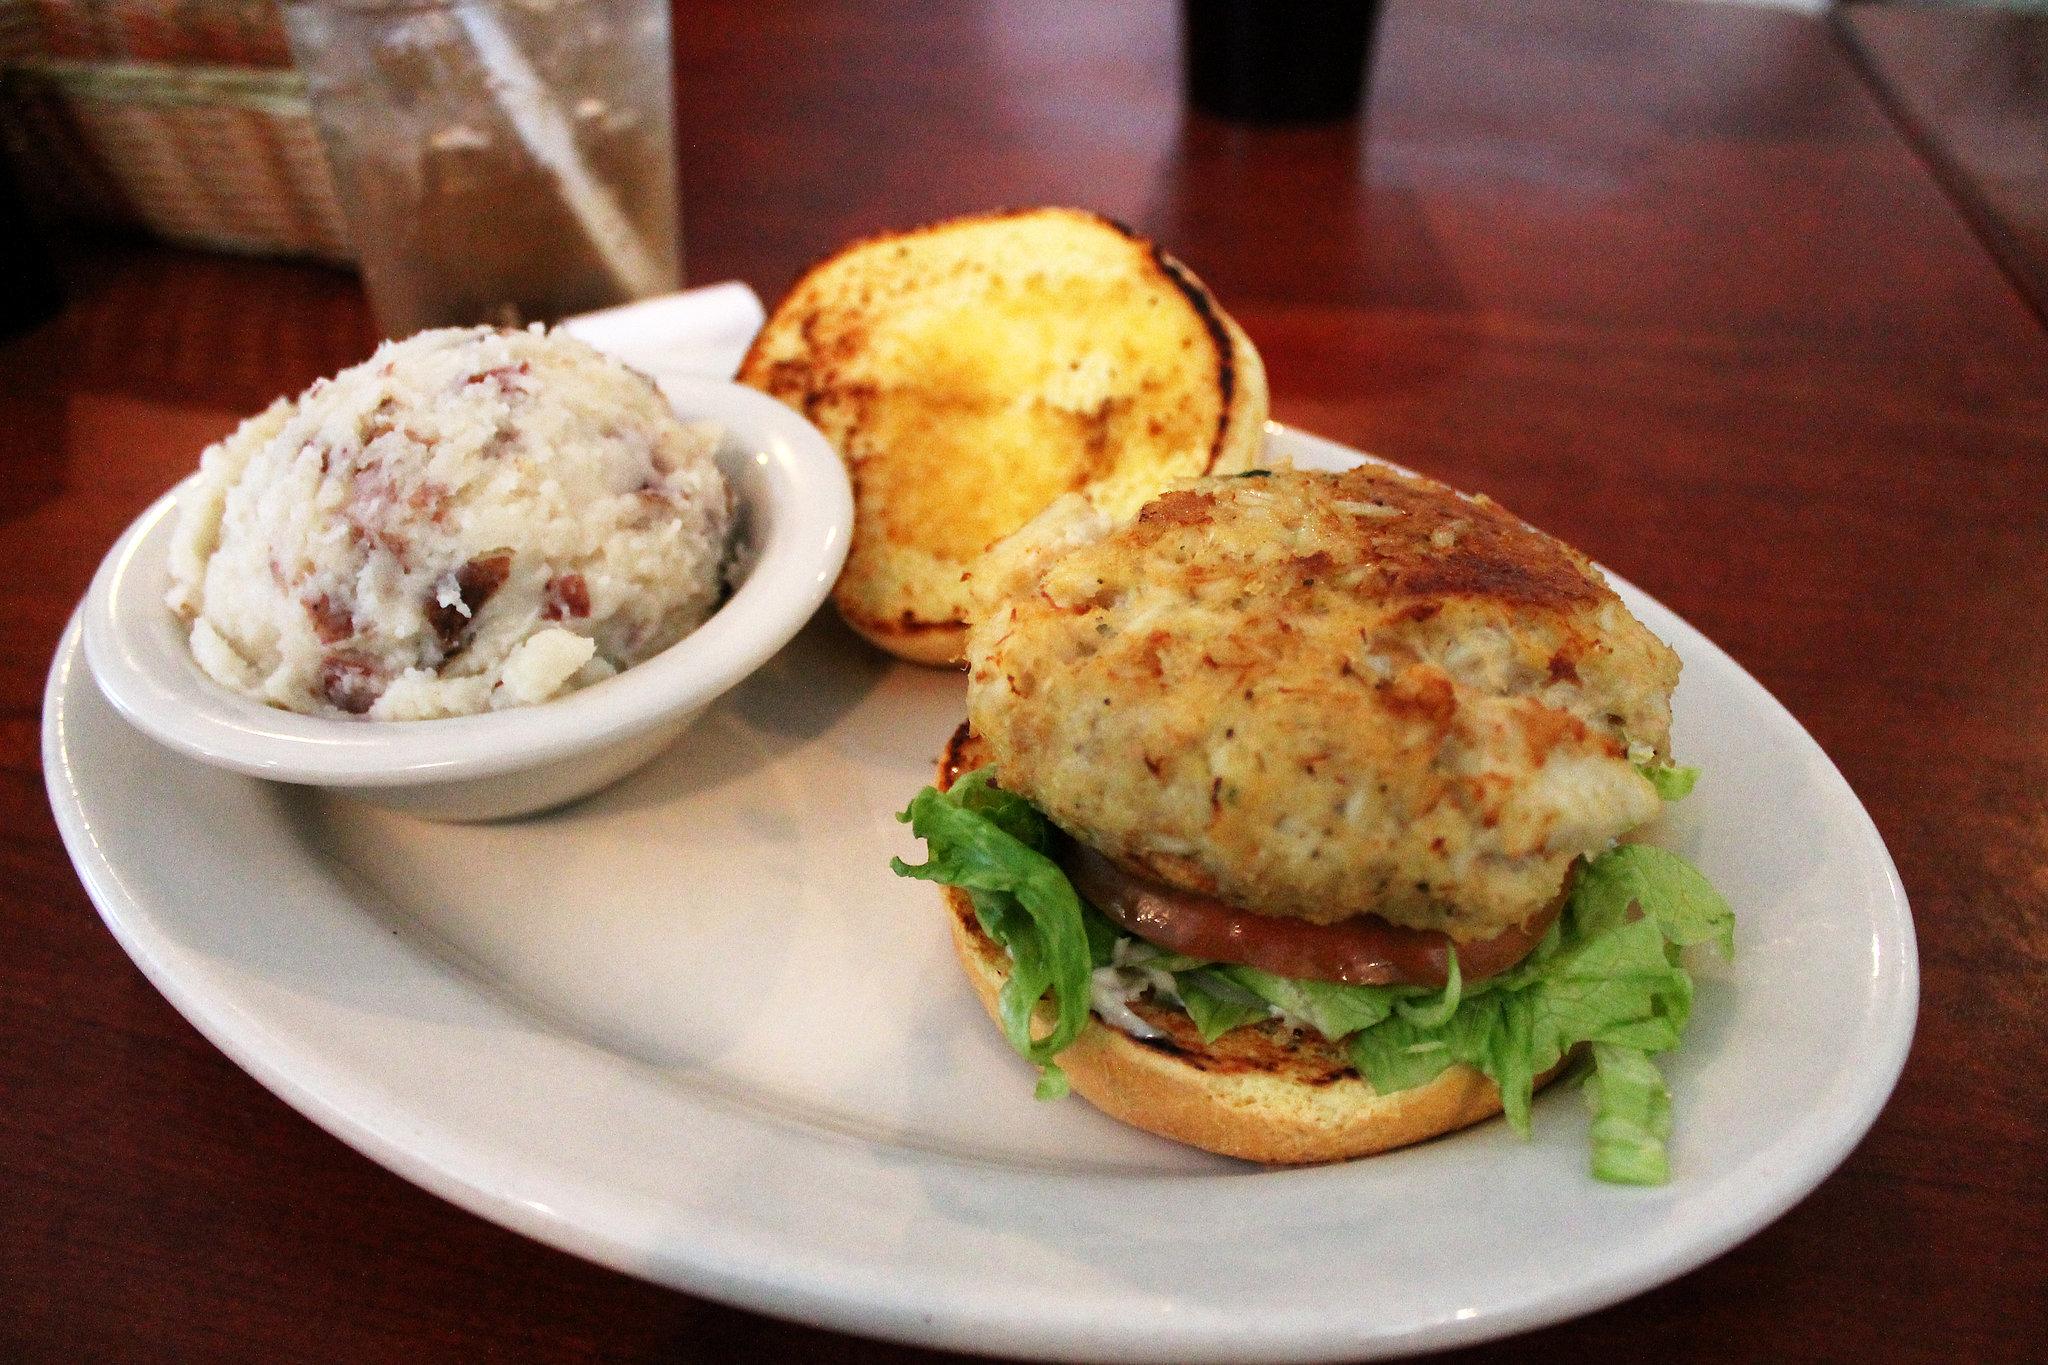 Maryland: Crab Cakes